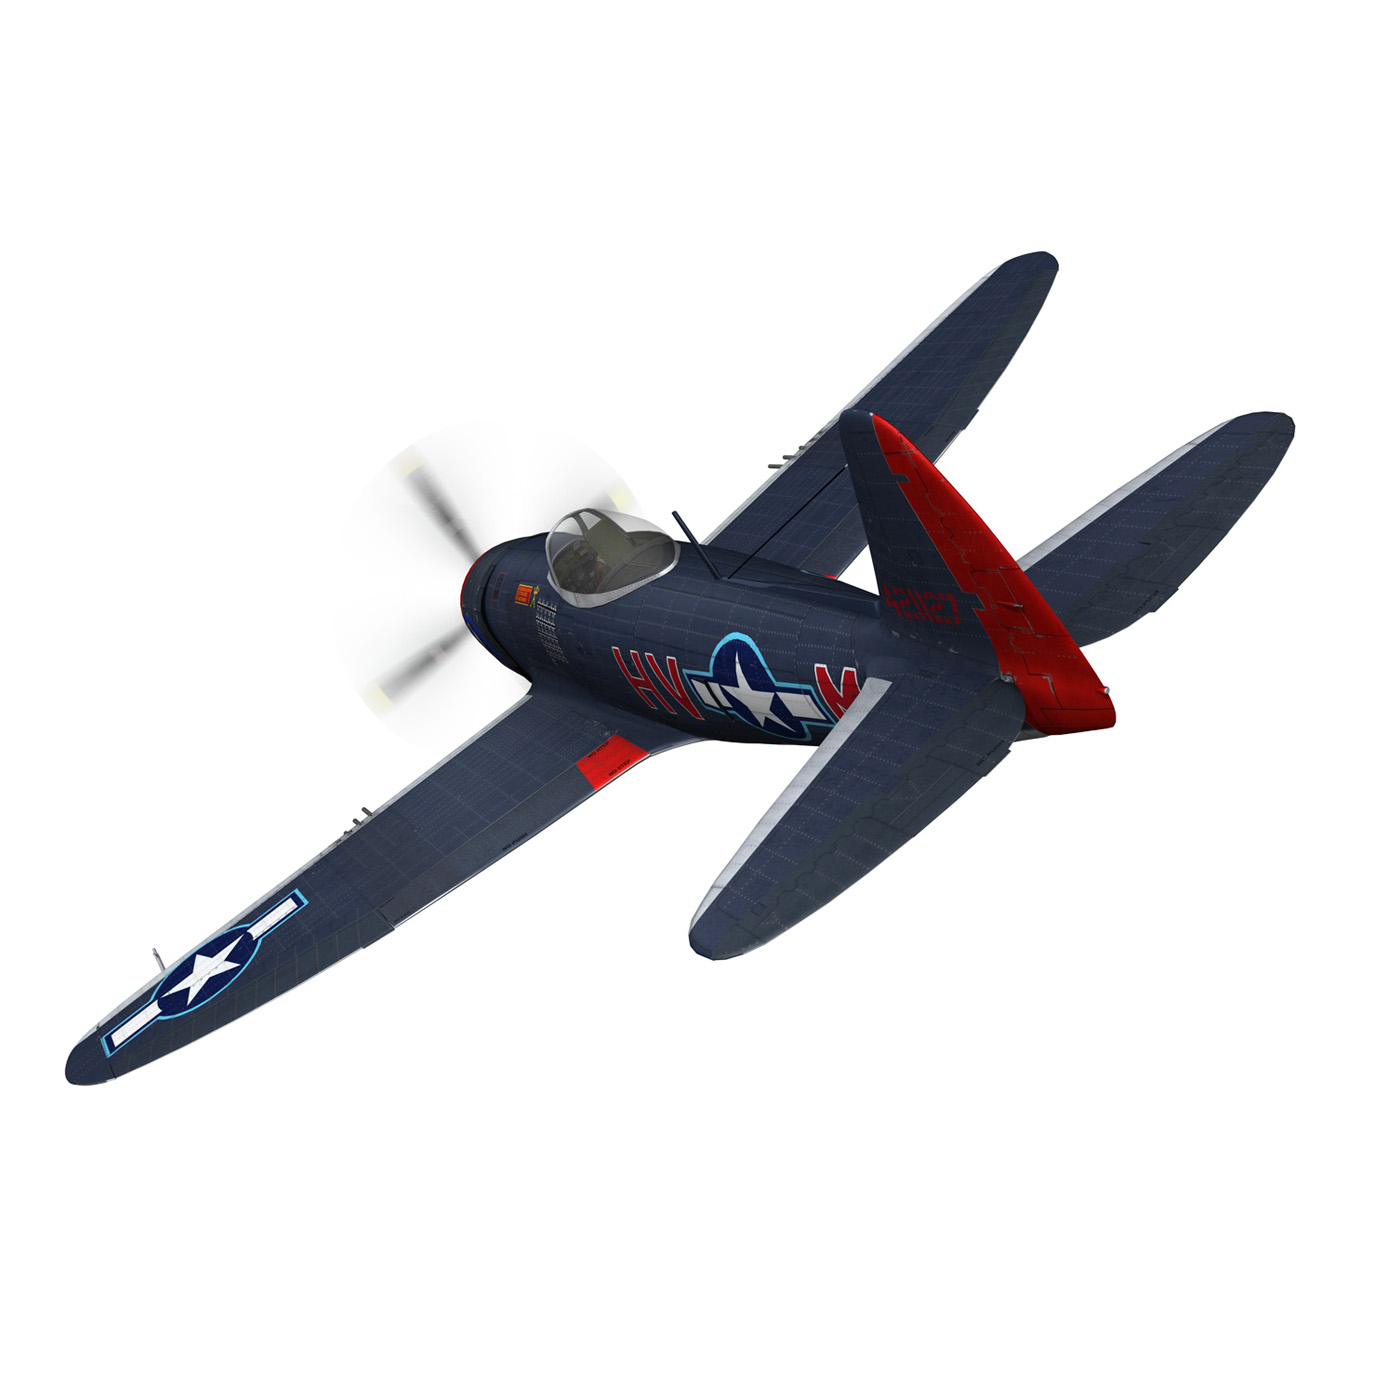 republic p-47m thunderbolt – pengie v 3d model 3ds c4d fbx lwo lw lws obj 279719